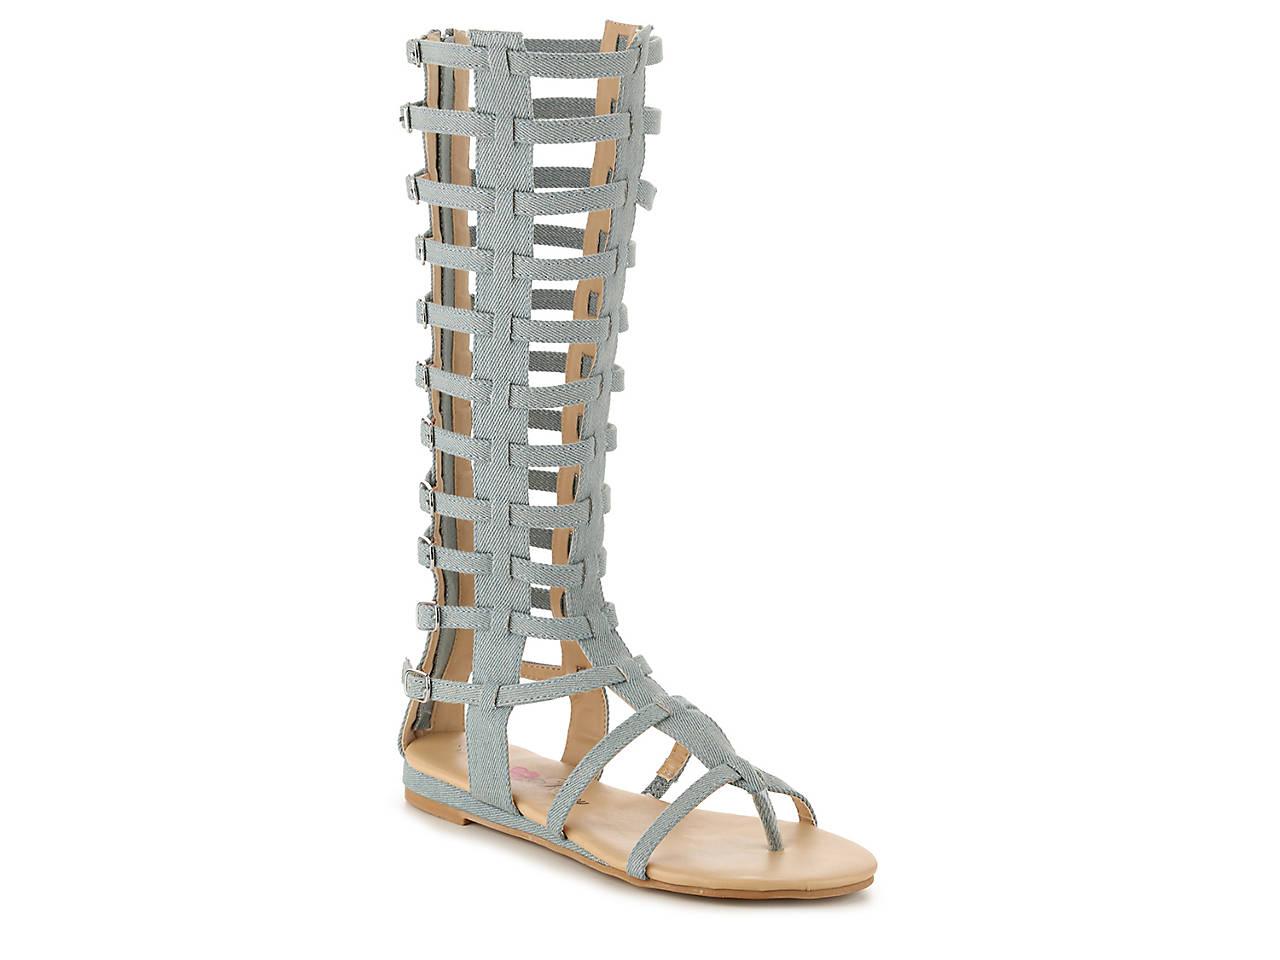 Copa Gladiator Sandal by Penny Loves Kenny